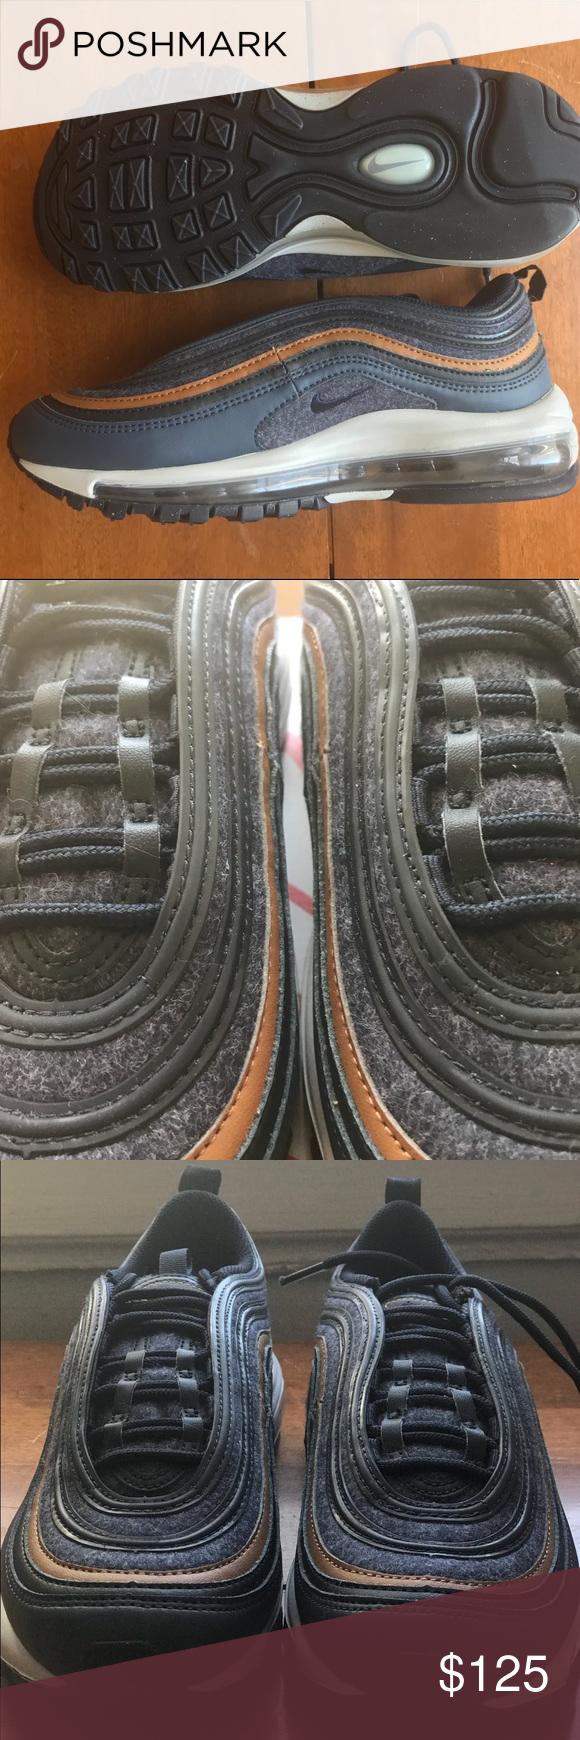 Nike Air Max '97 UL '17 SE Casual Shoes (NWT) NWT